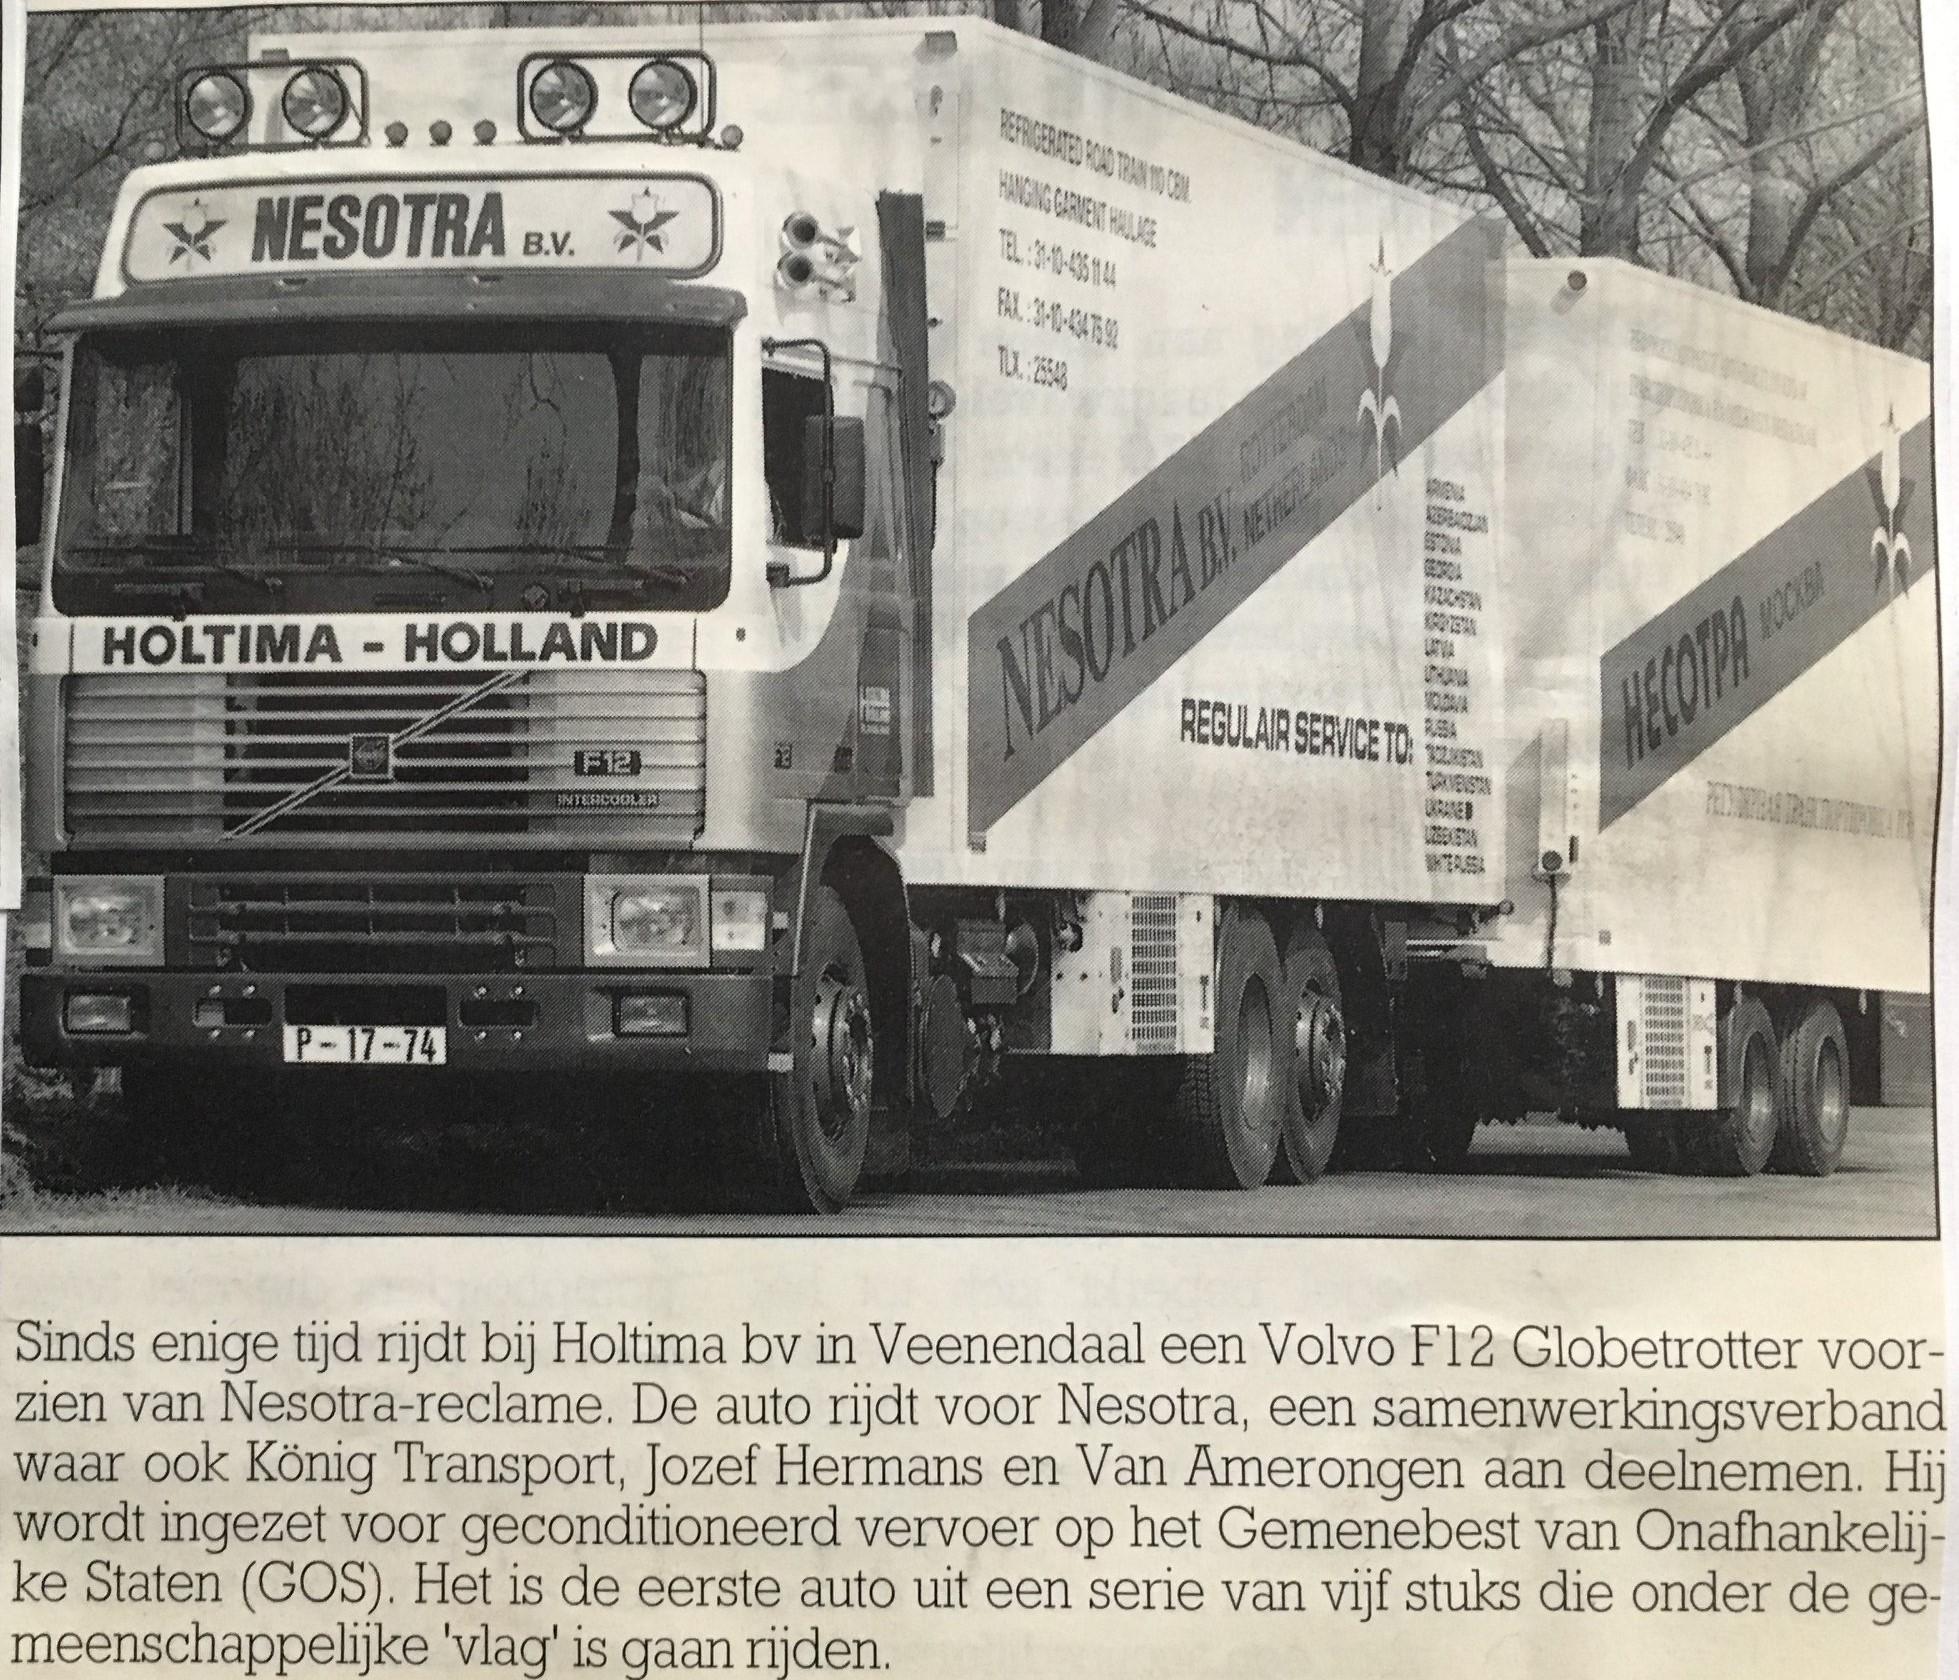 jaren-90-media--Rudi-Zemann-archief-2